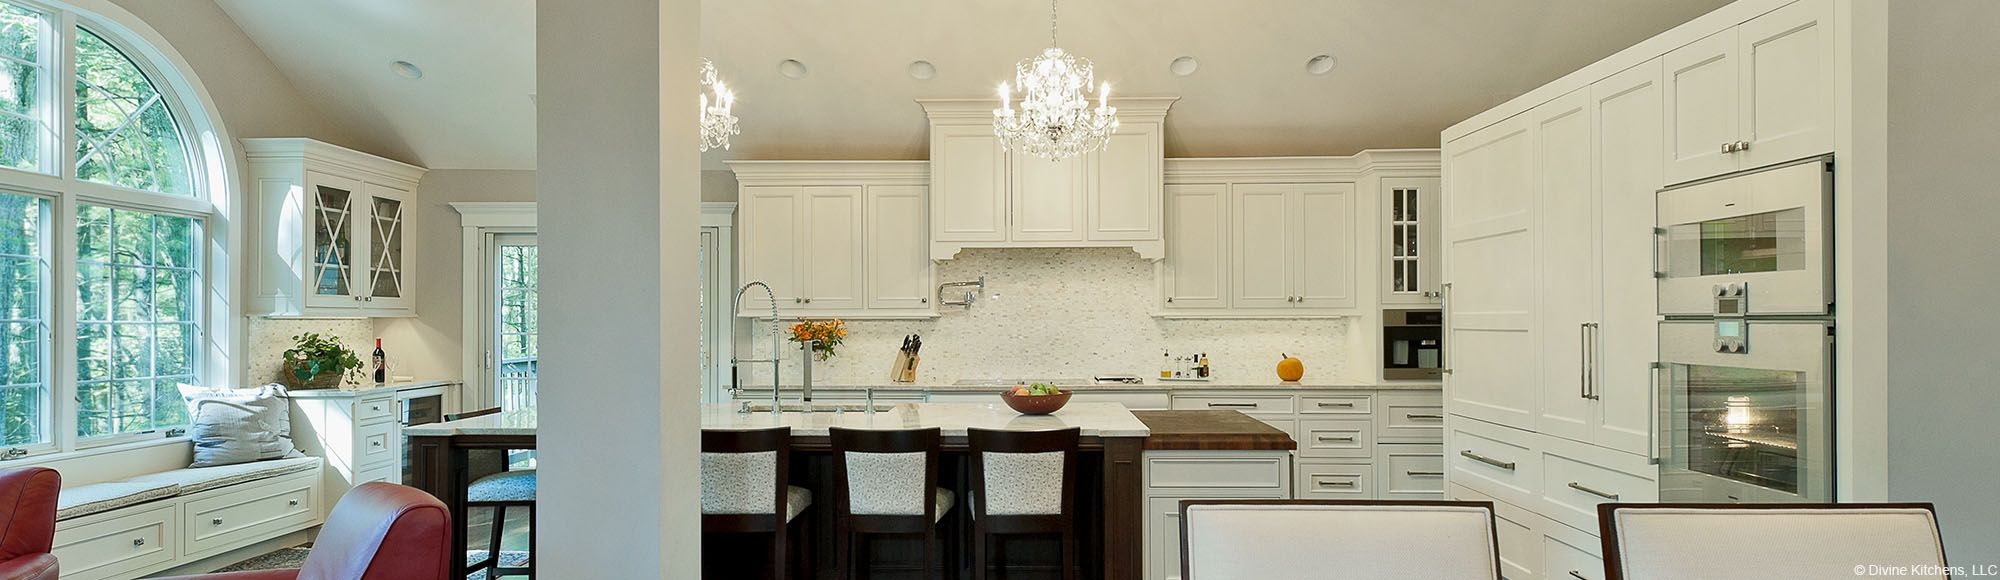 Show-Stopping Kitchen   Divine Kitchens   Kitchen design ideas ...